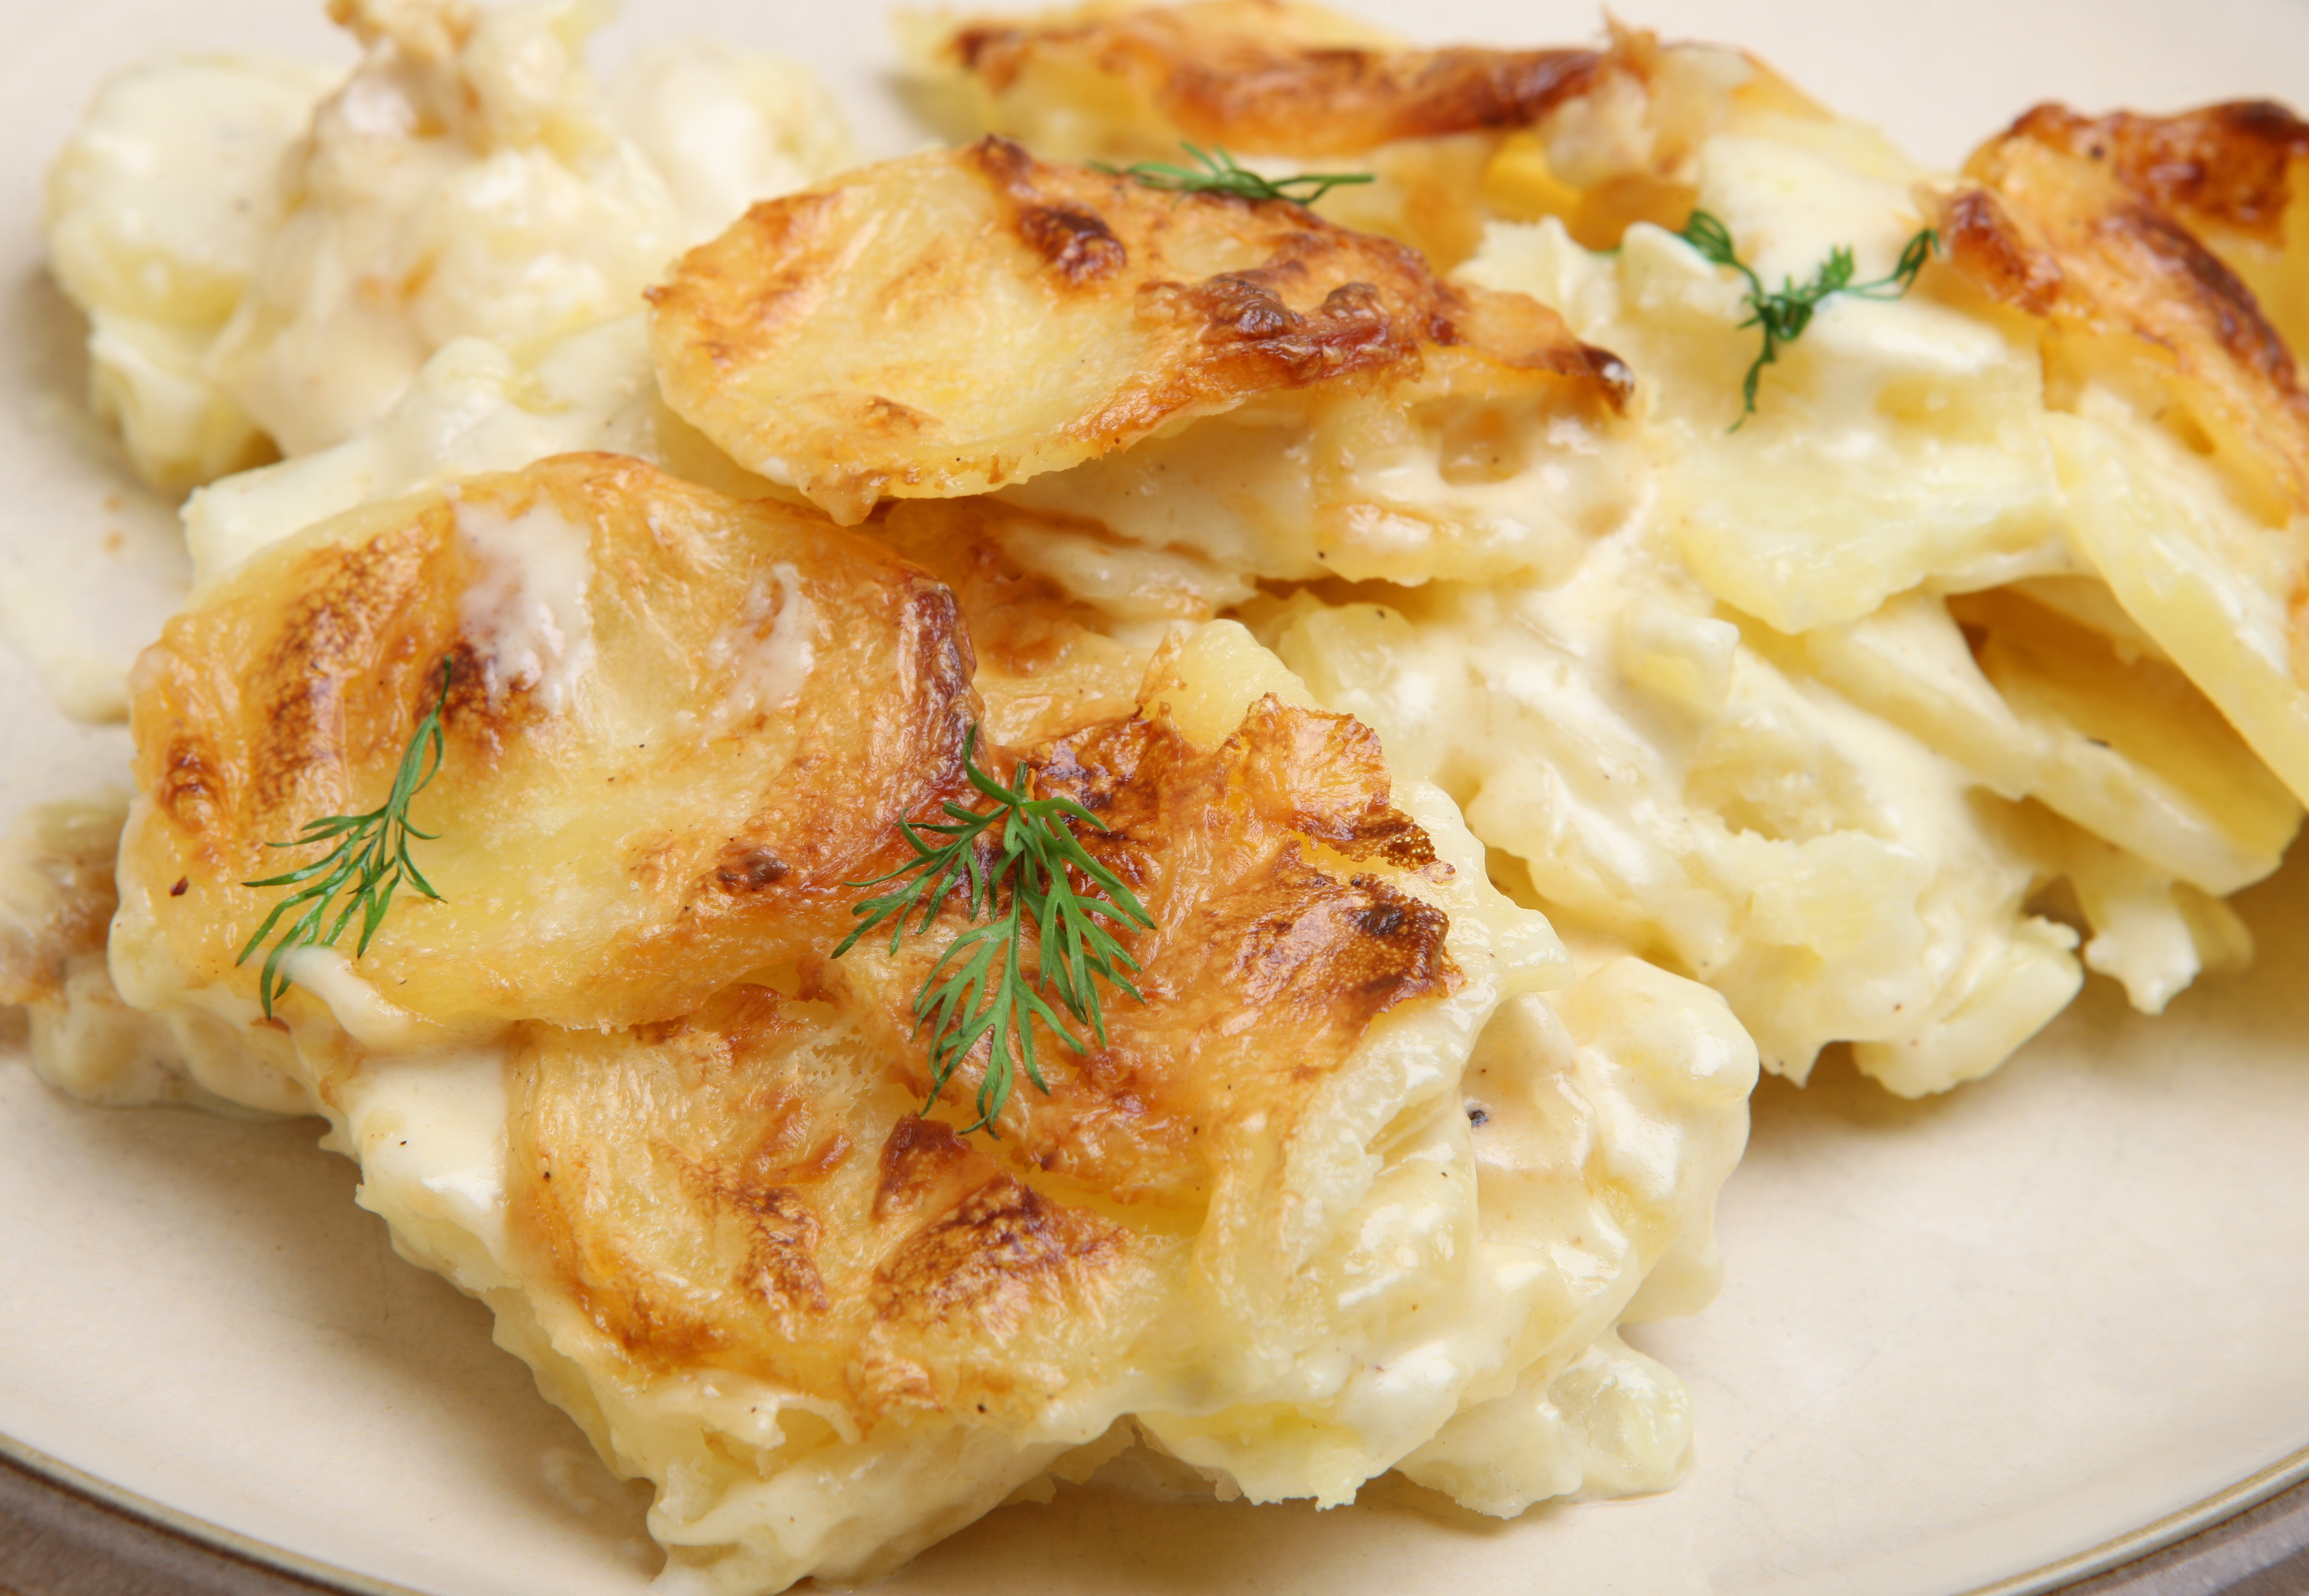 ... potatoes scalloped potatoes with leeks easy scalloped potatoes classic